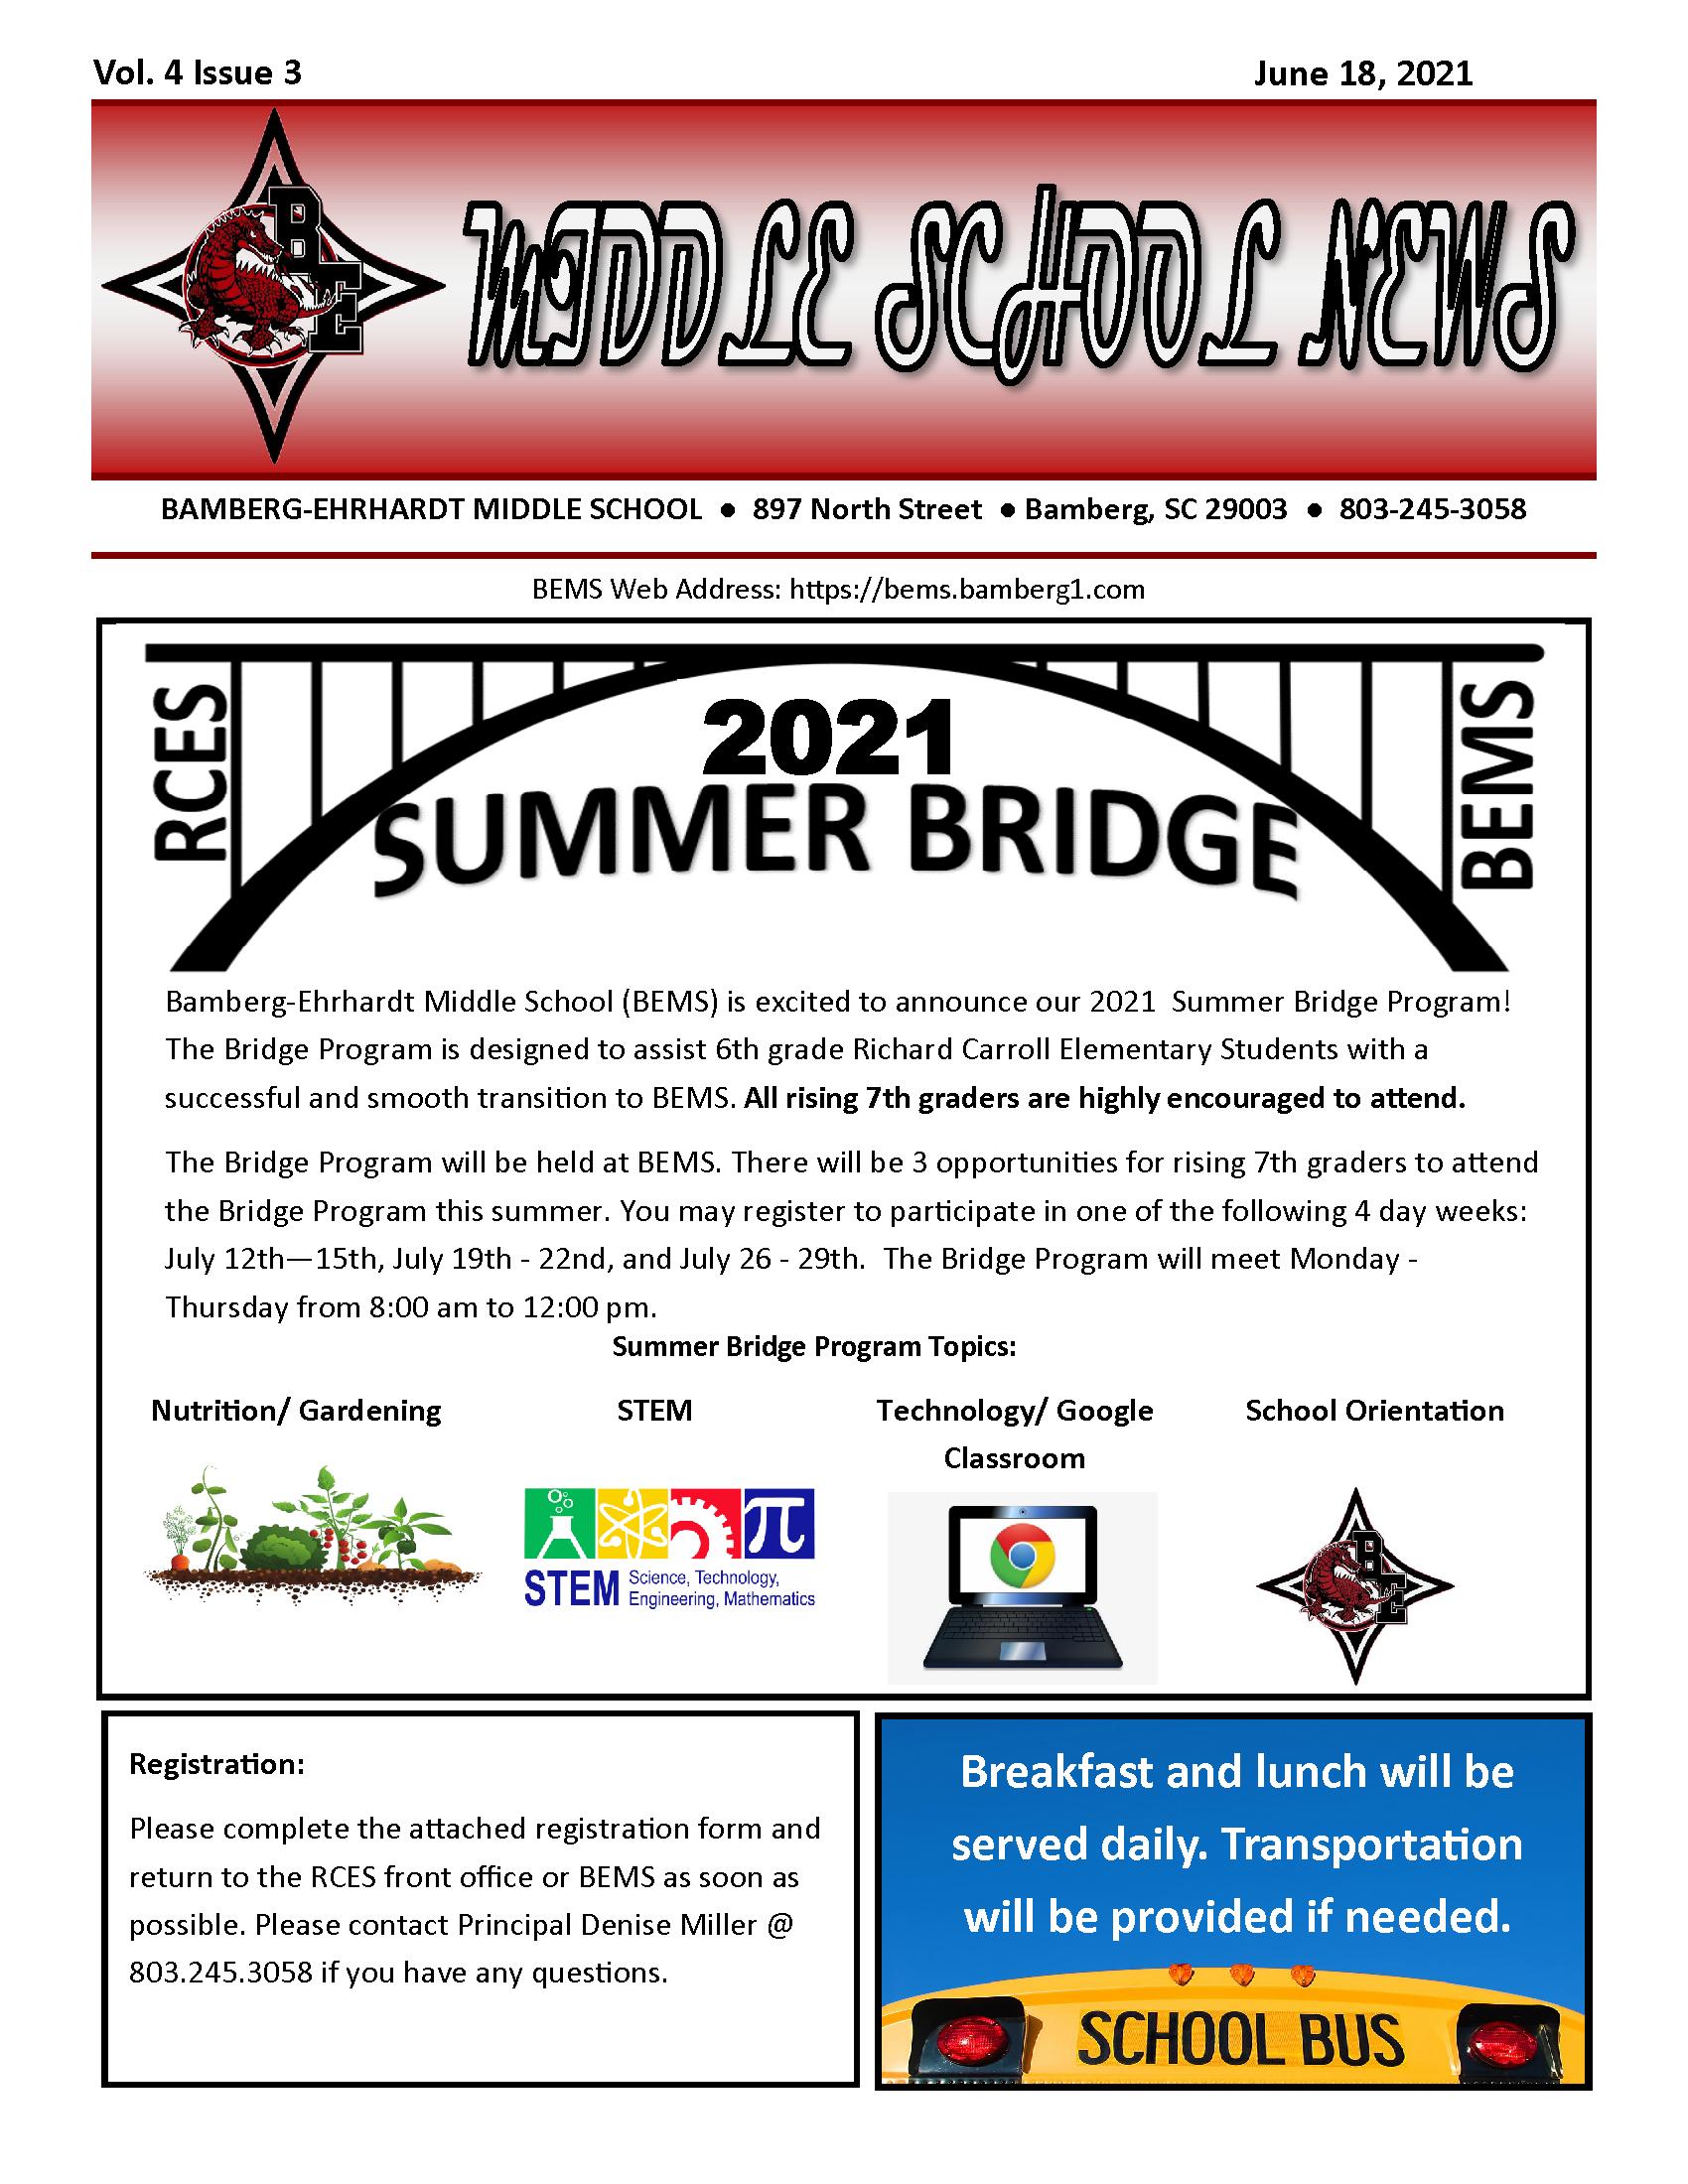 BEMS 2021 Summer Bridge Program